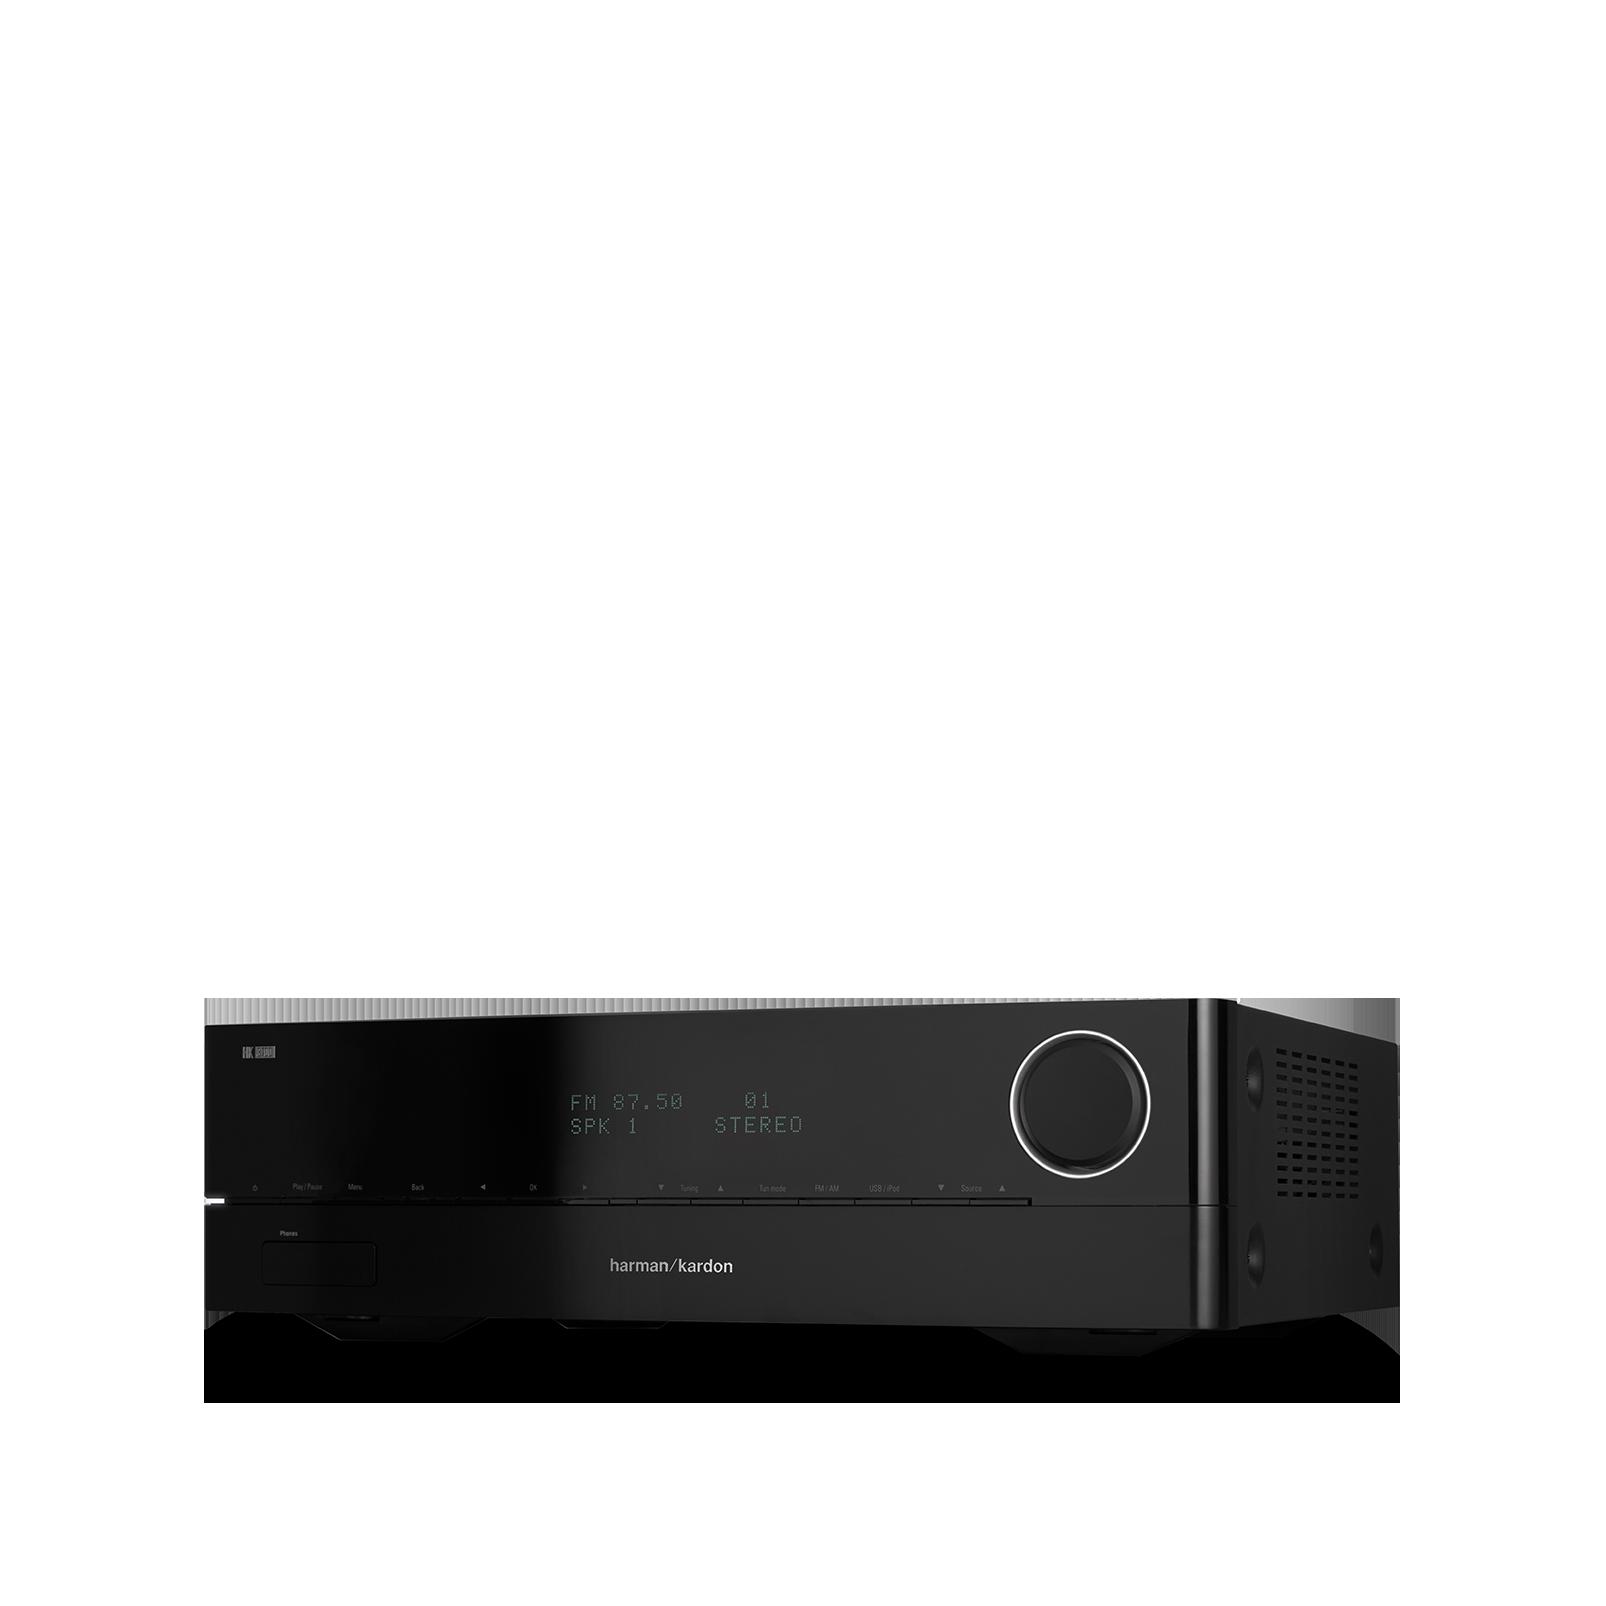 HK 3700 - Black - 170 watt stereo receiver with network connectivity - Detailshot 3